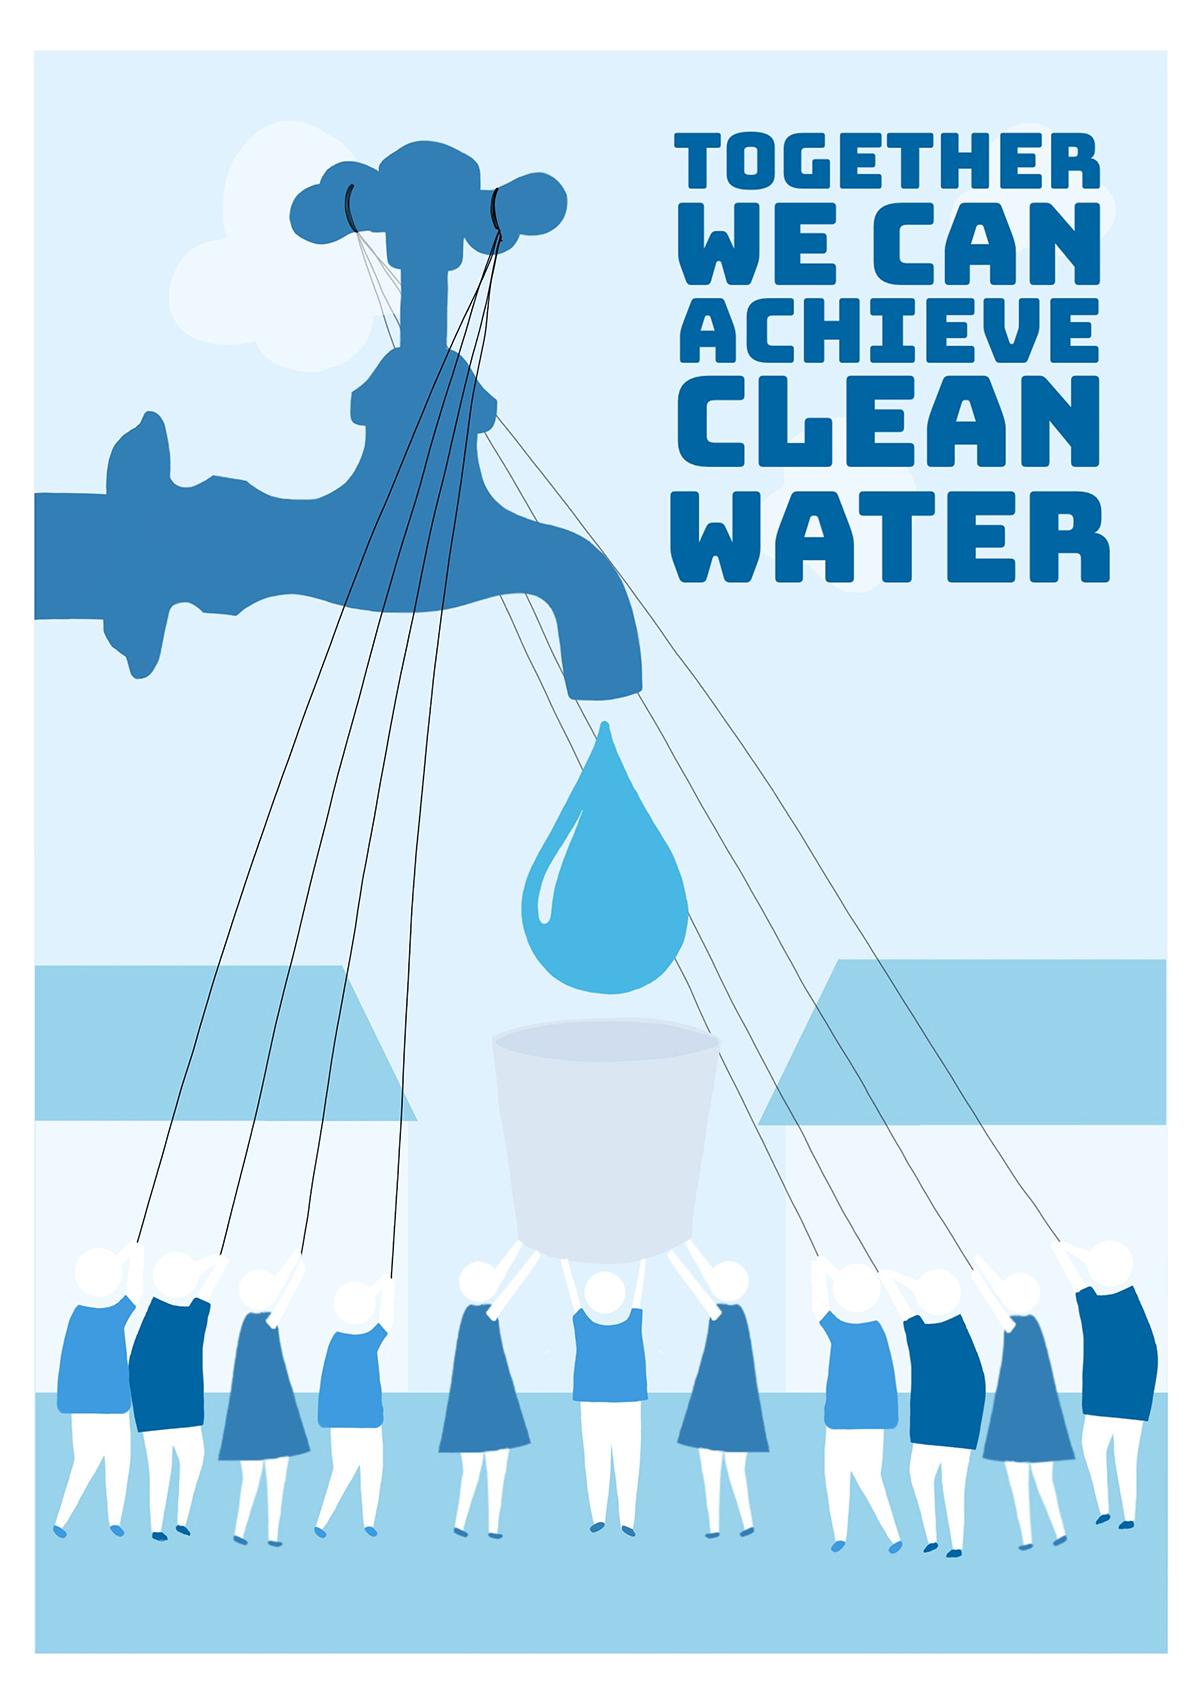 WaterAid Art of Change prize